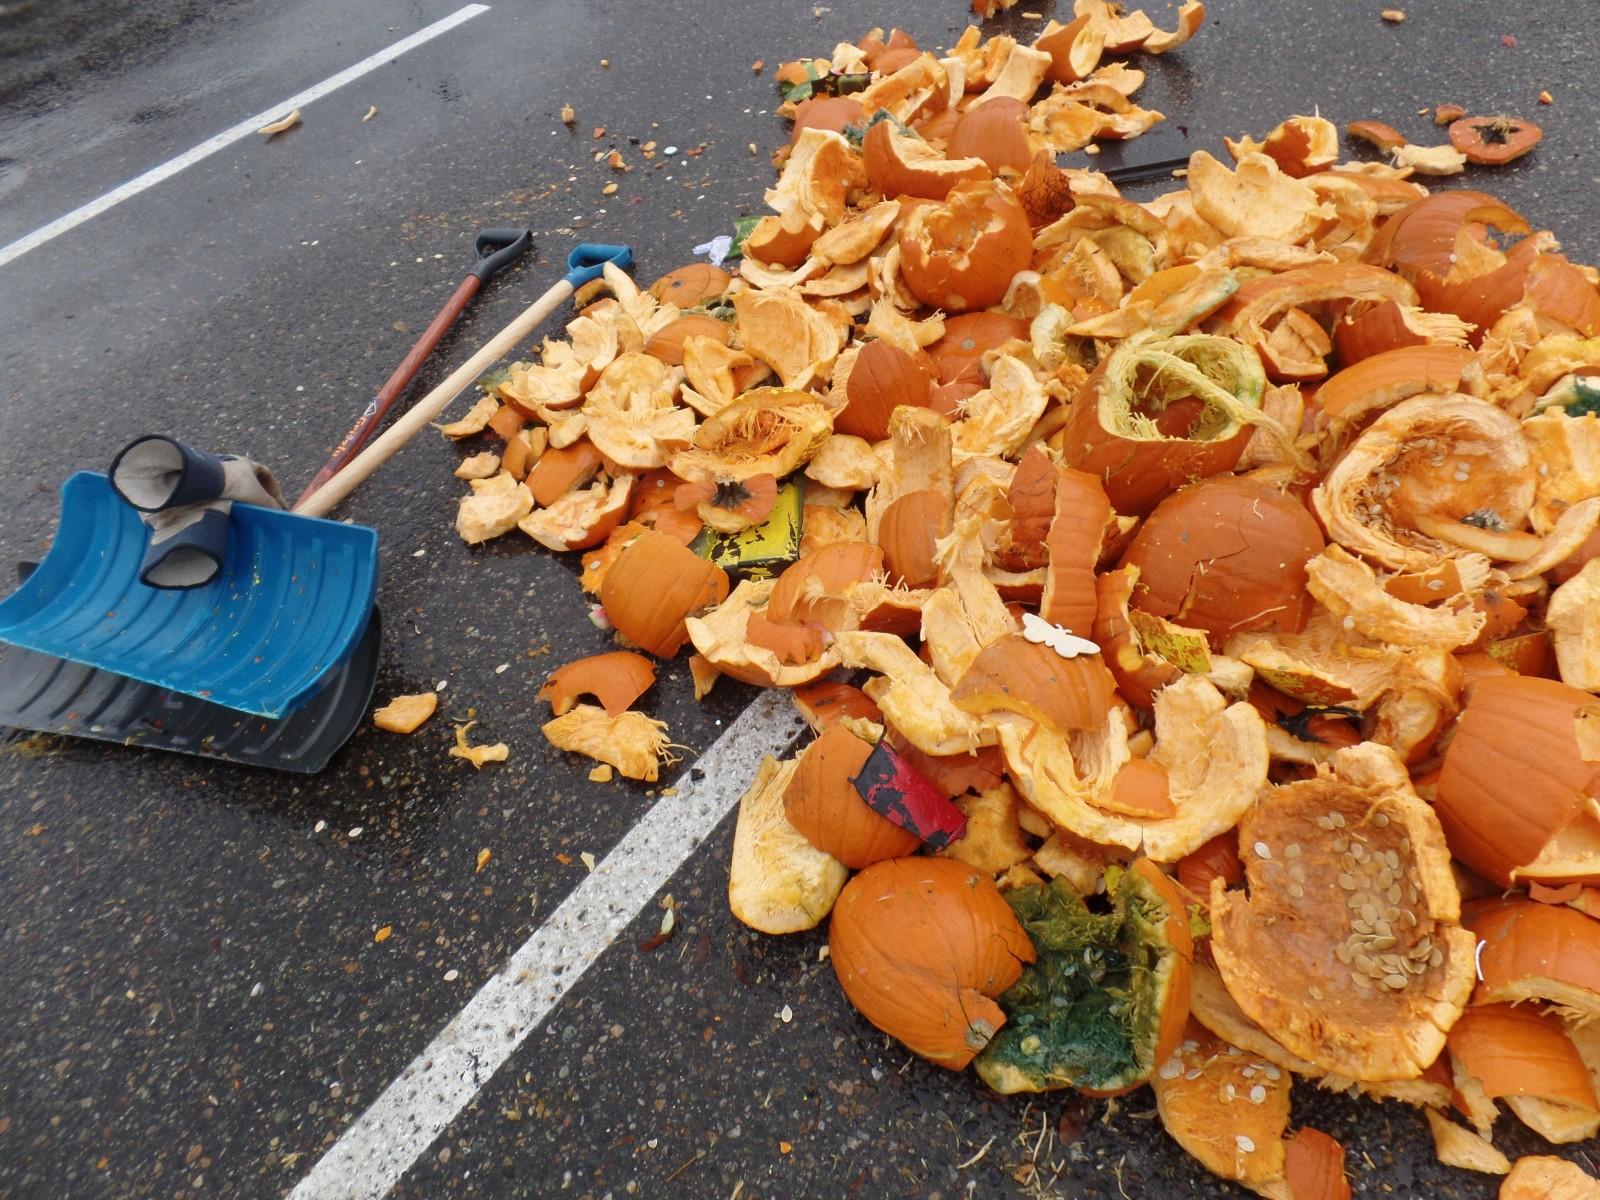 FunChaser @ Rotten Pumpkin Festival